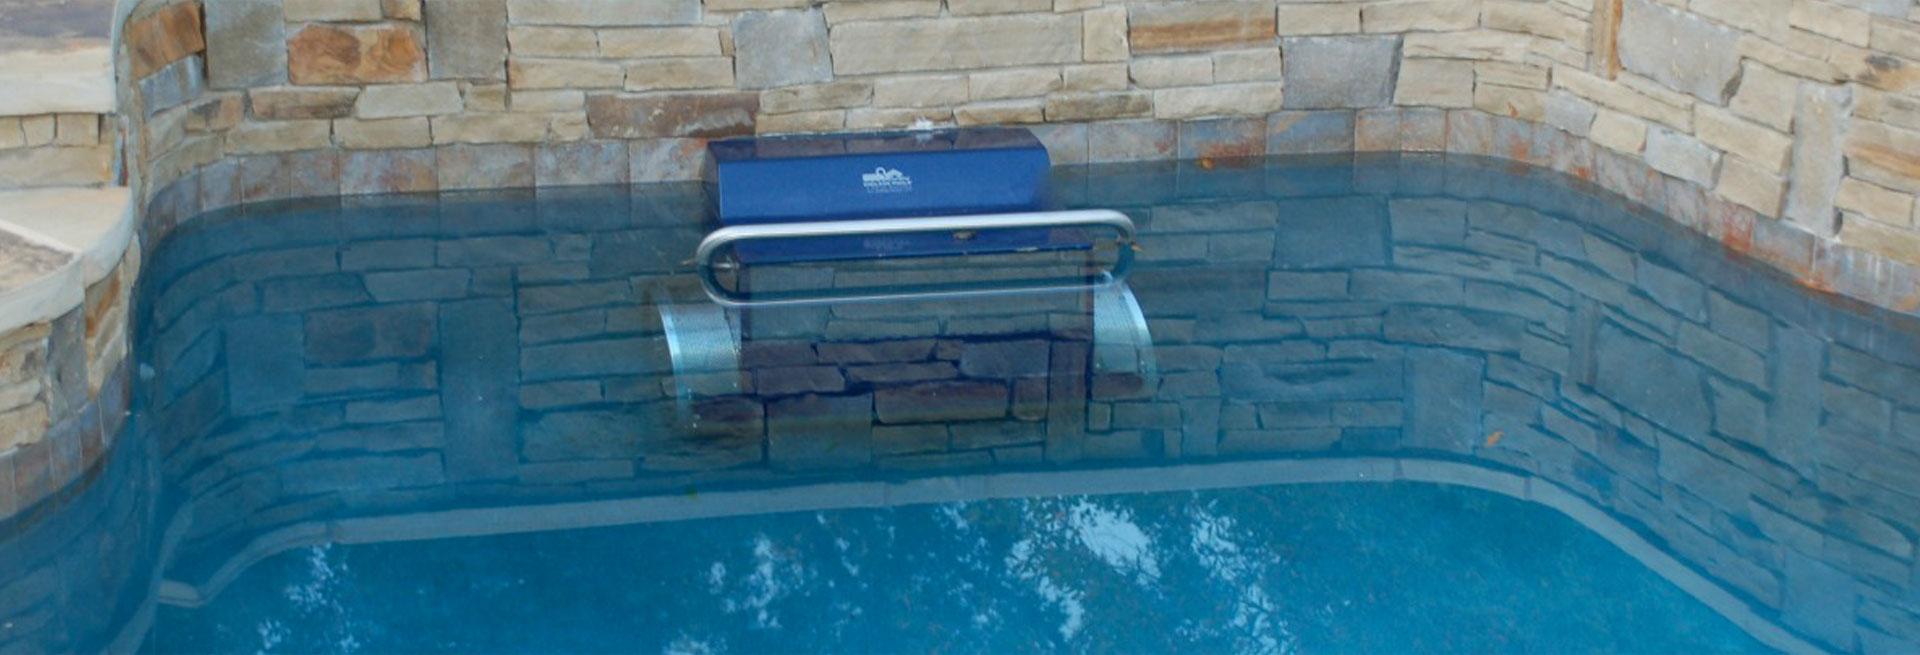 Install fast lane swim machine in your swimming pool - Swimming pool supplies lubbock tx ...